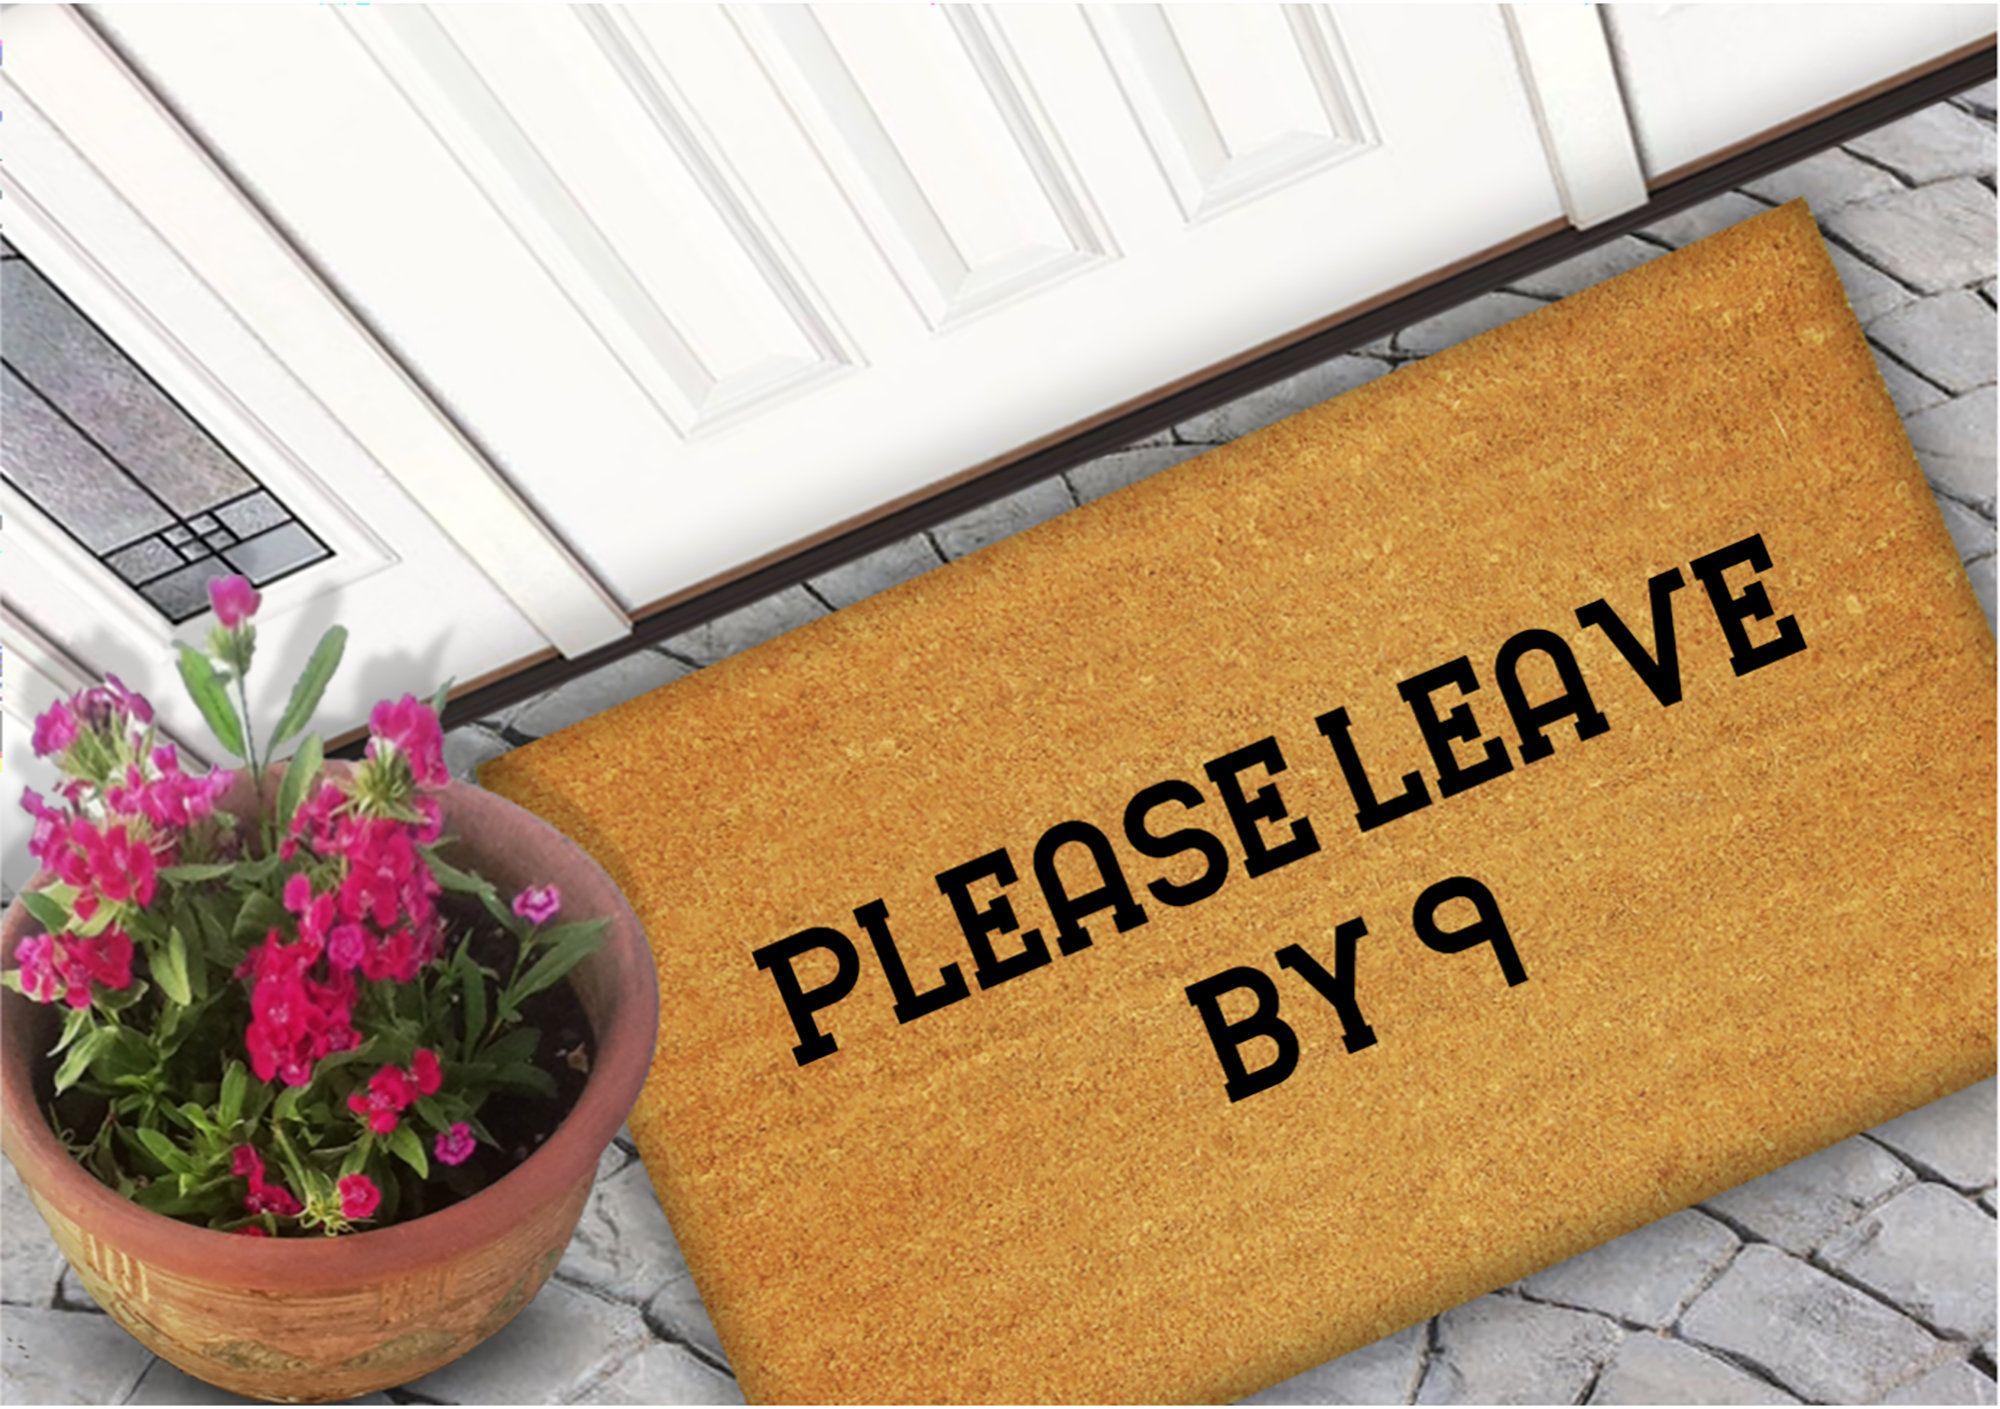 Please Leave By 9 Doormat Welcome Home Coir Doormat Funny